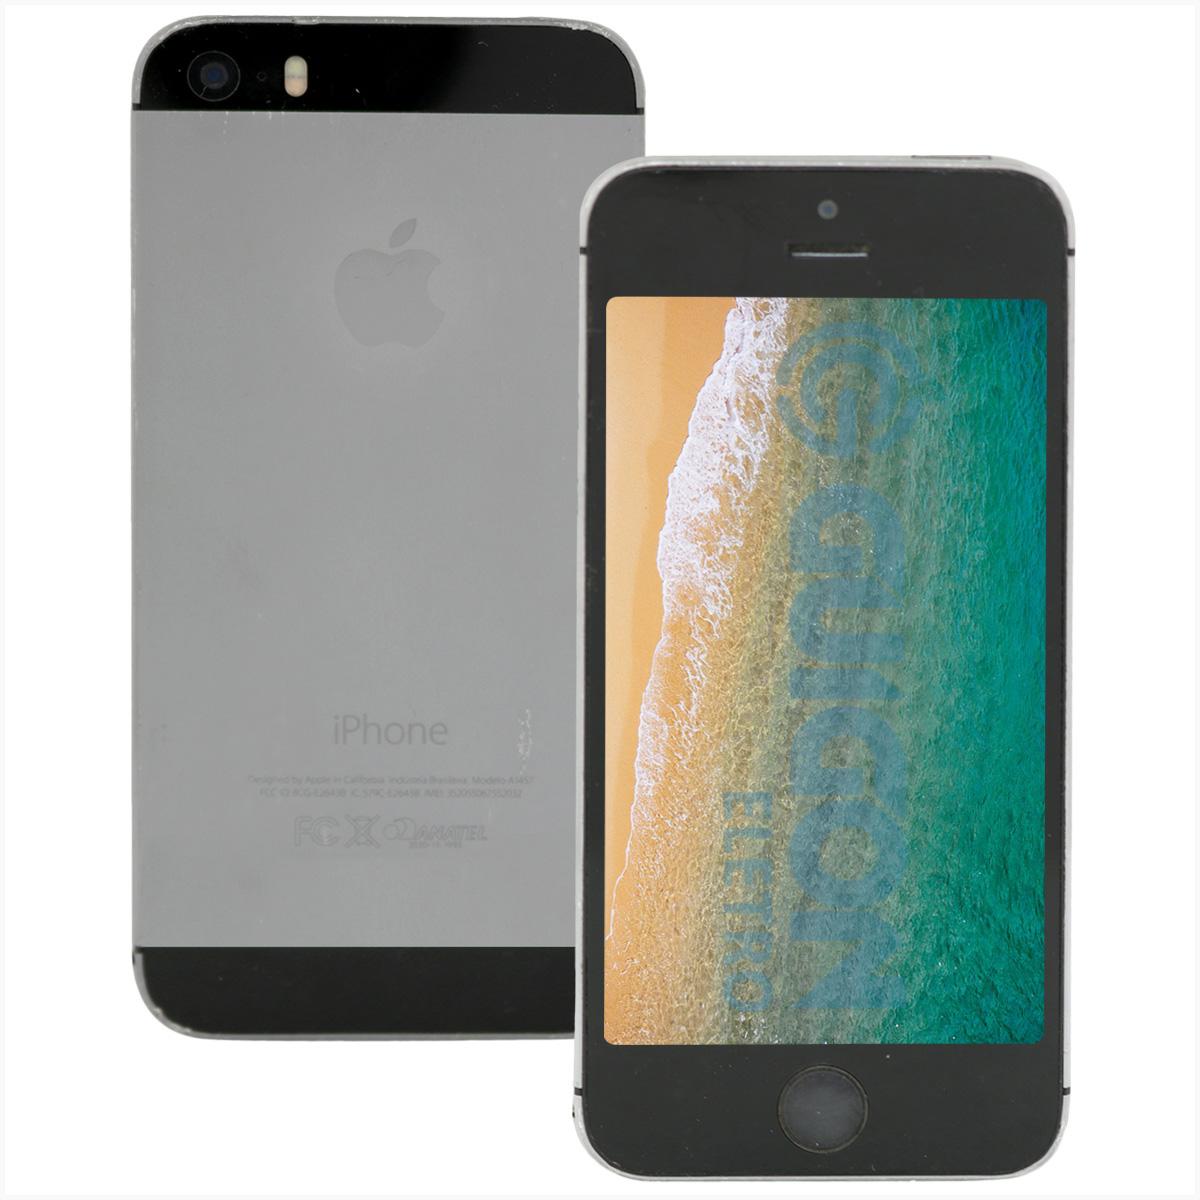 Iphone 5s a1457 64gb - usado